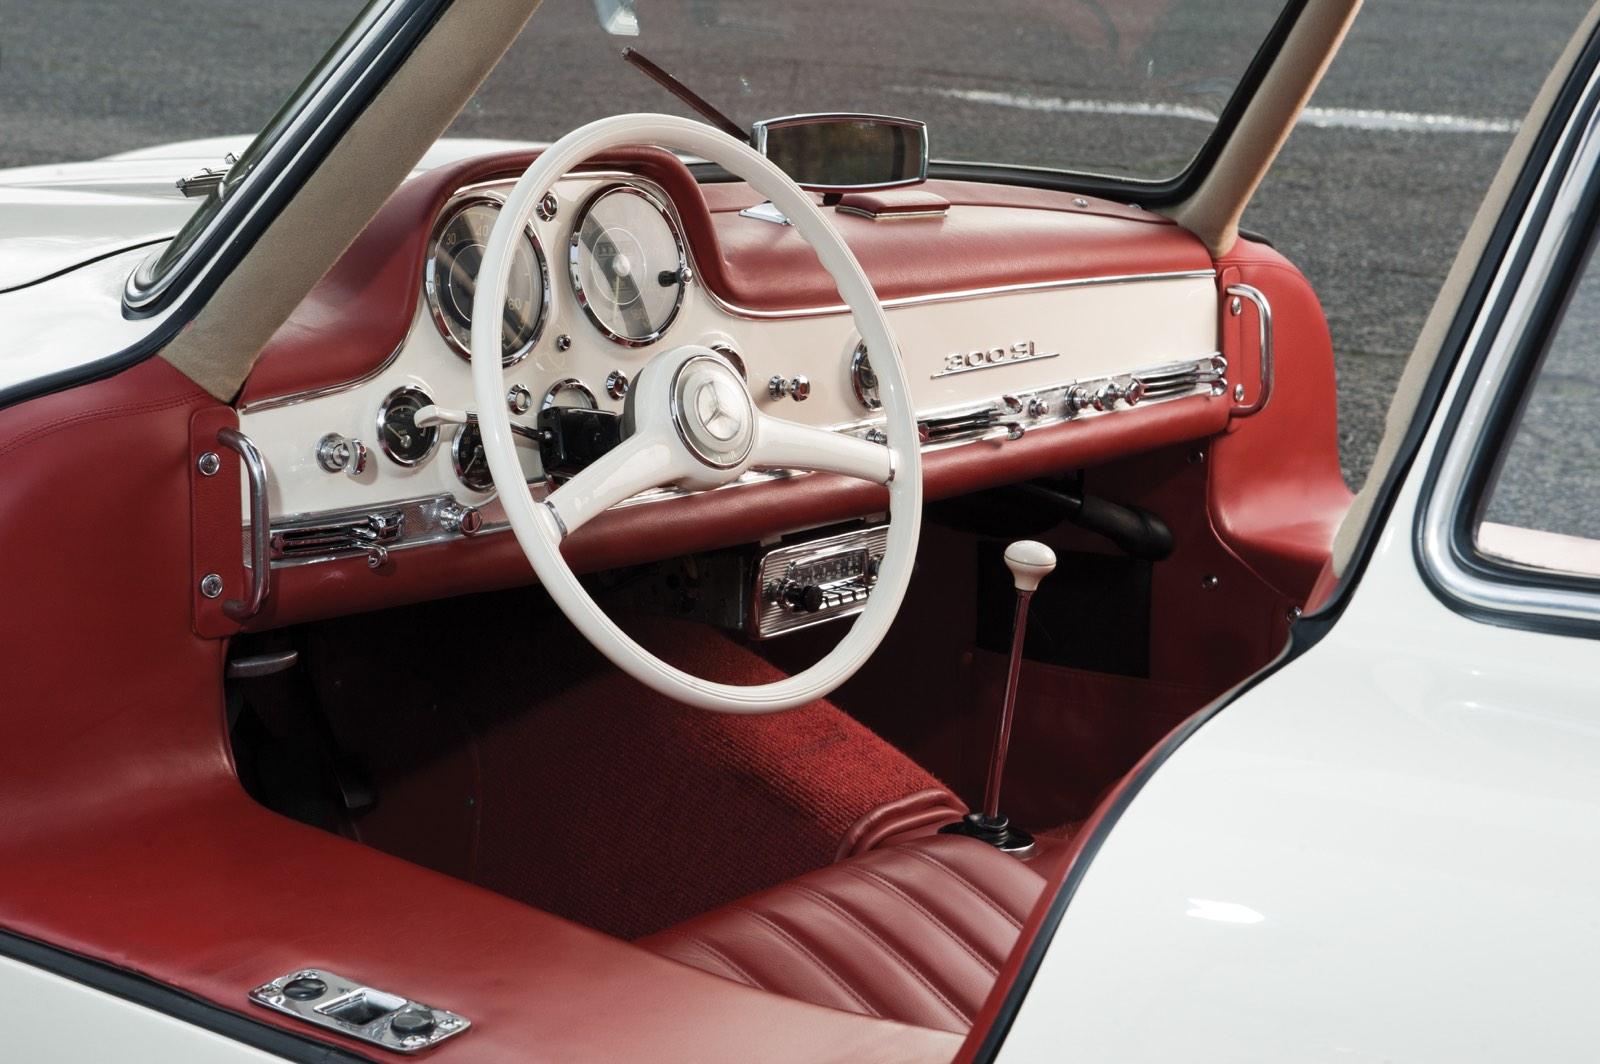 Mercedes-Benz 300 SL Gullwing Red Interior